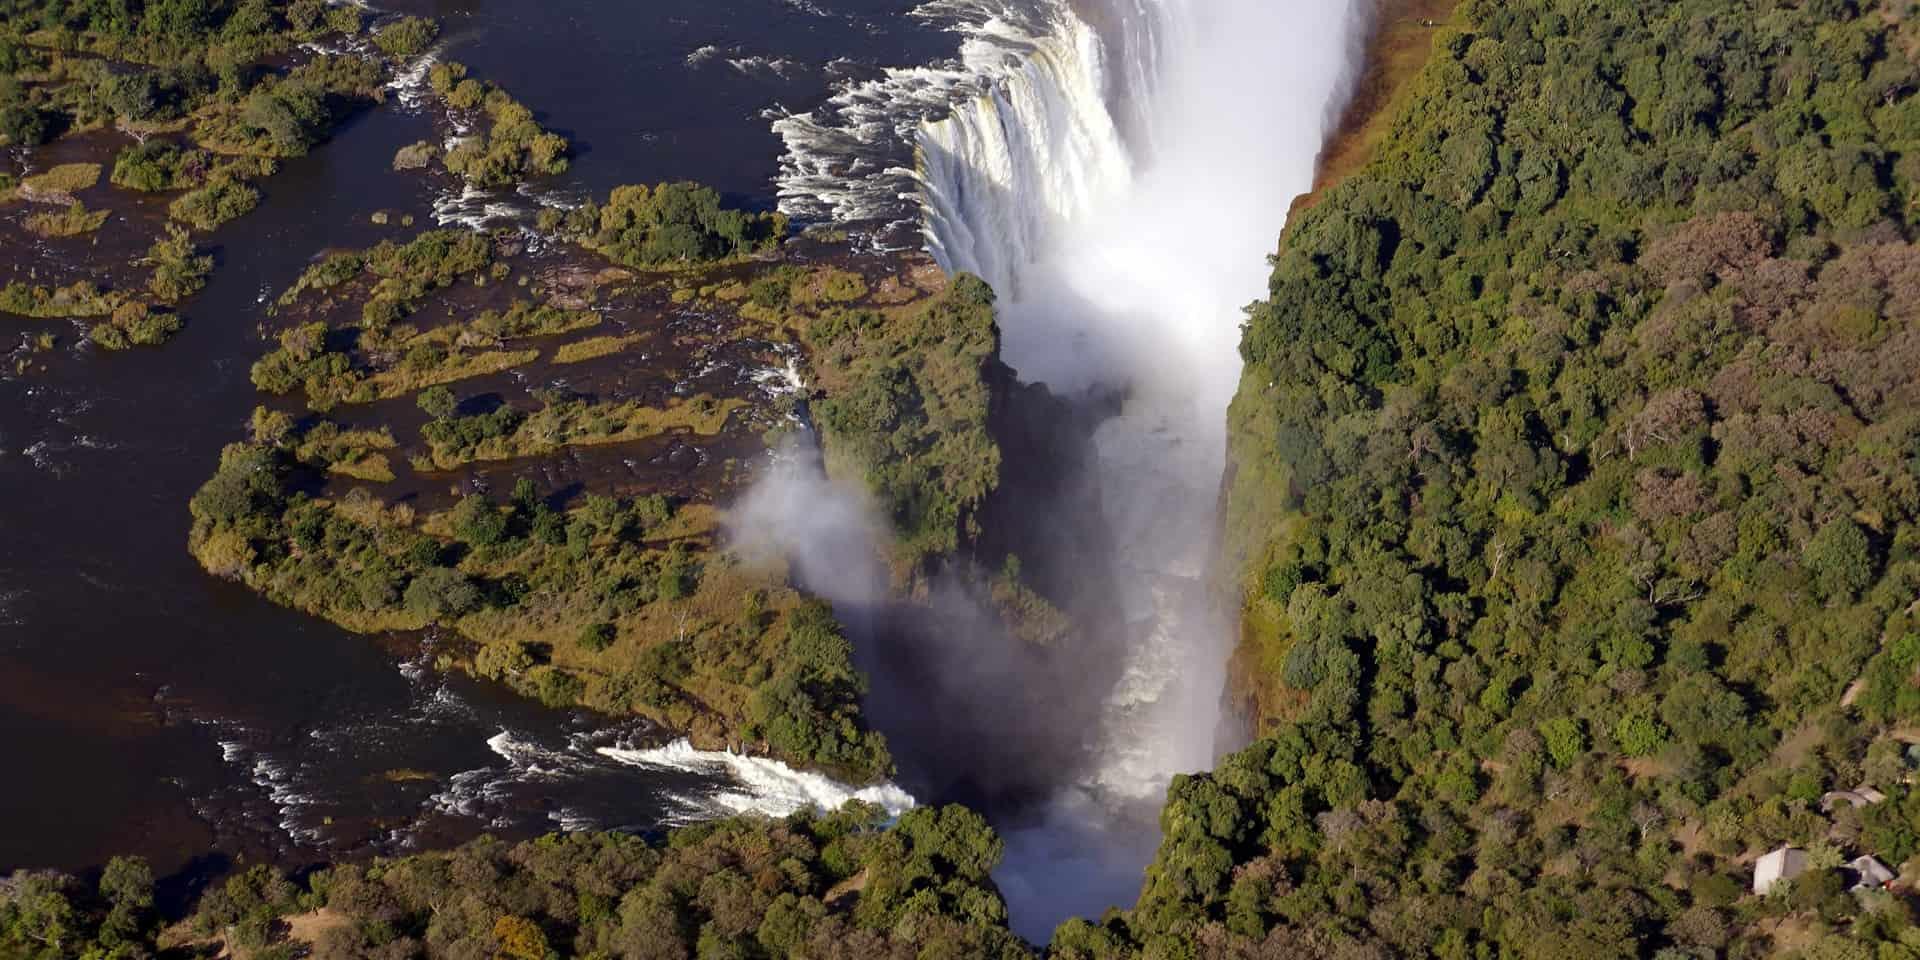 Туры в Замбия. Водопад Виктория. Вид с вертолета